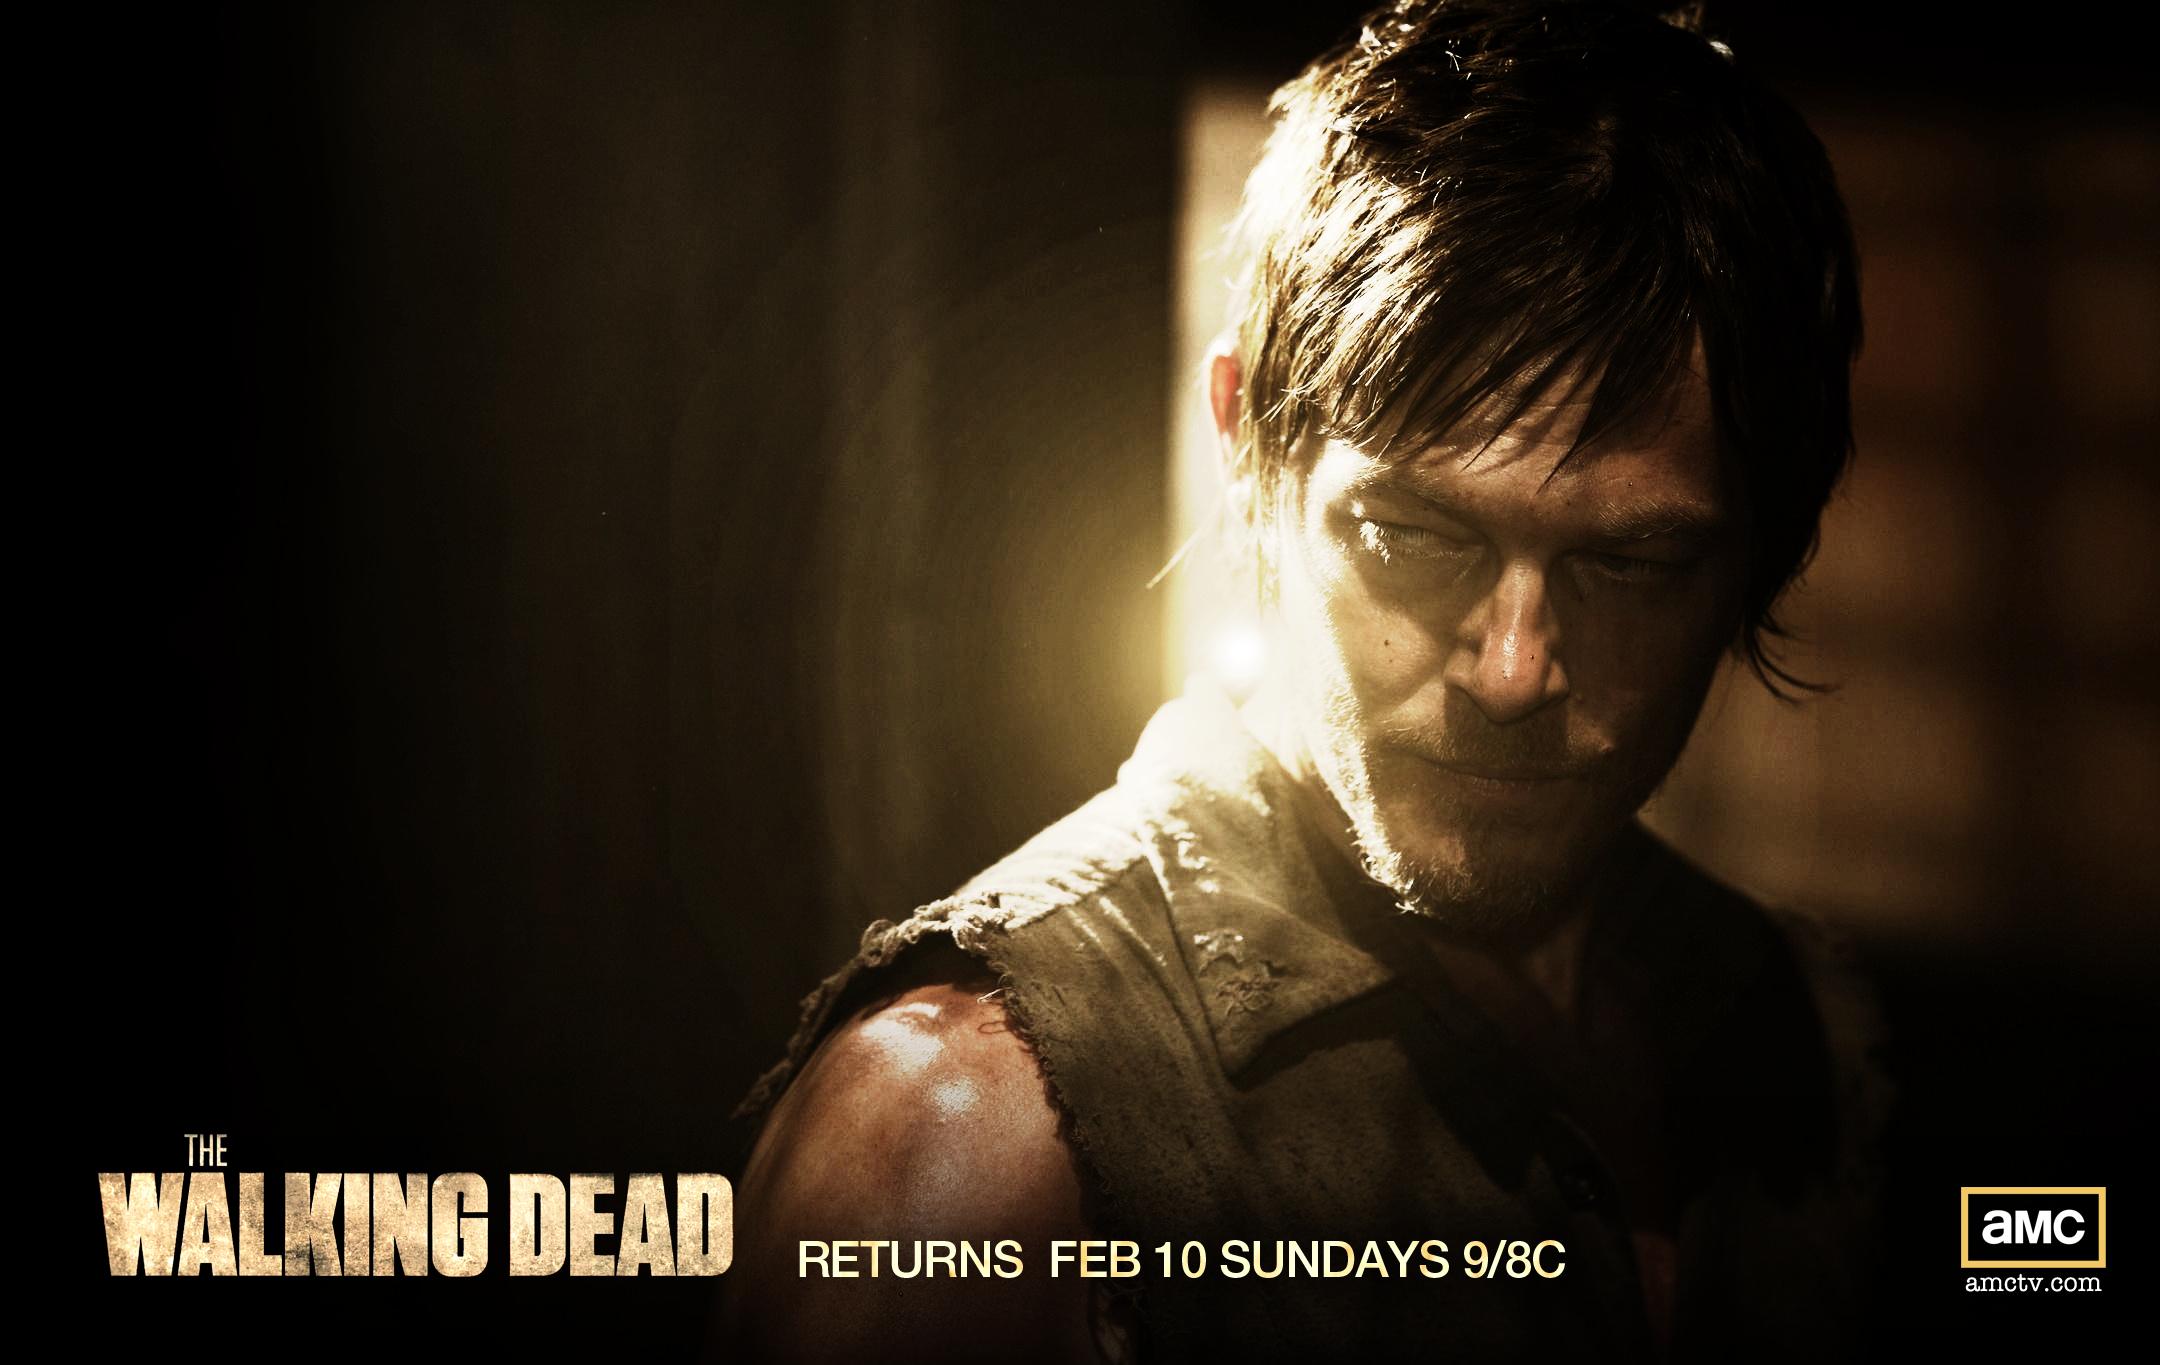 The Walking Dead Wallpaper Daryl Download